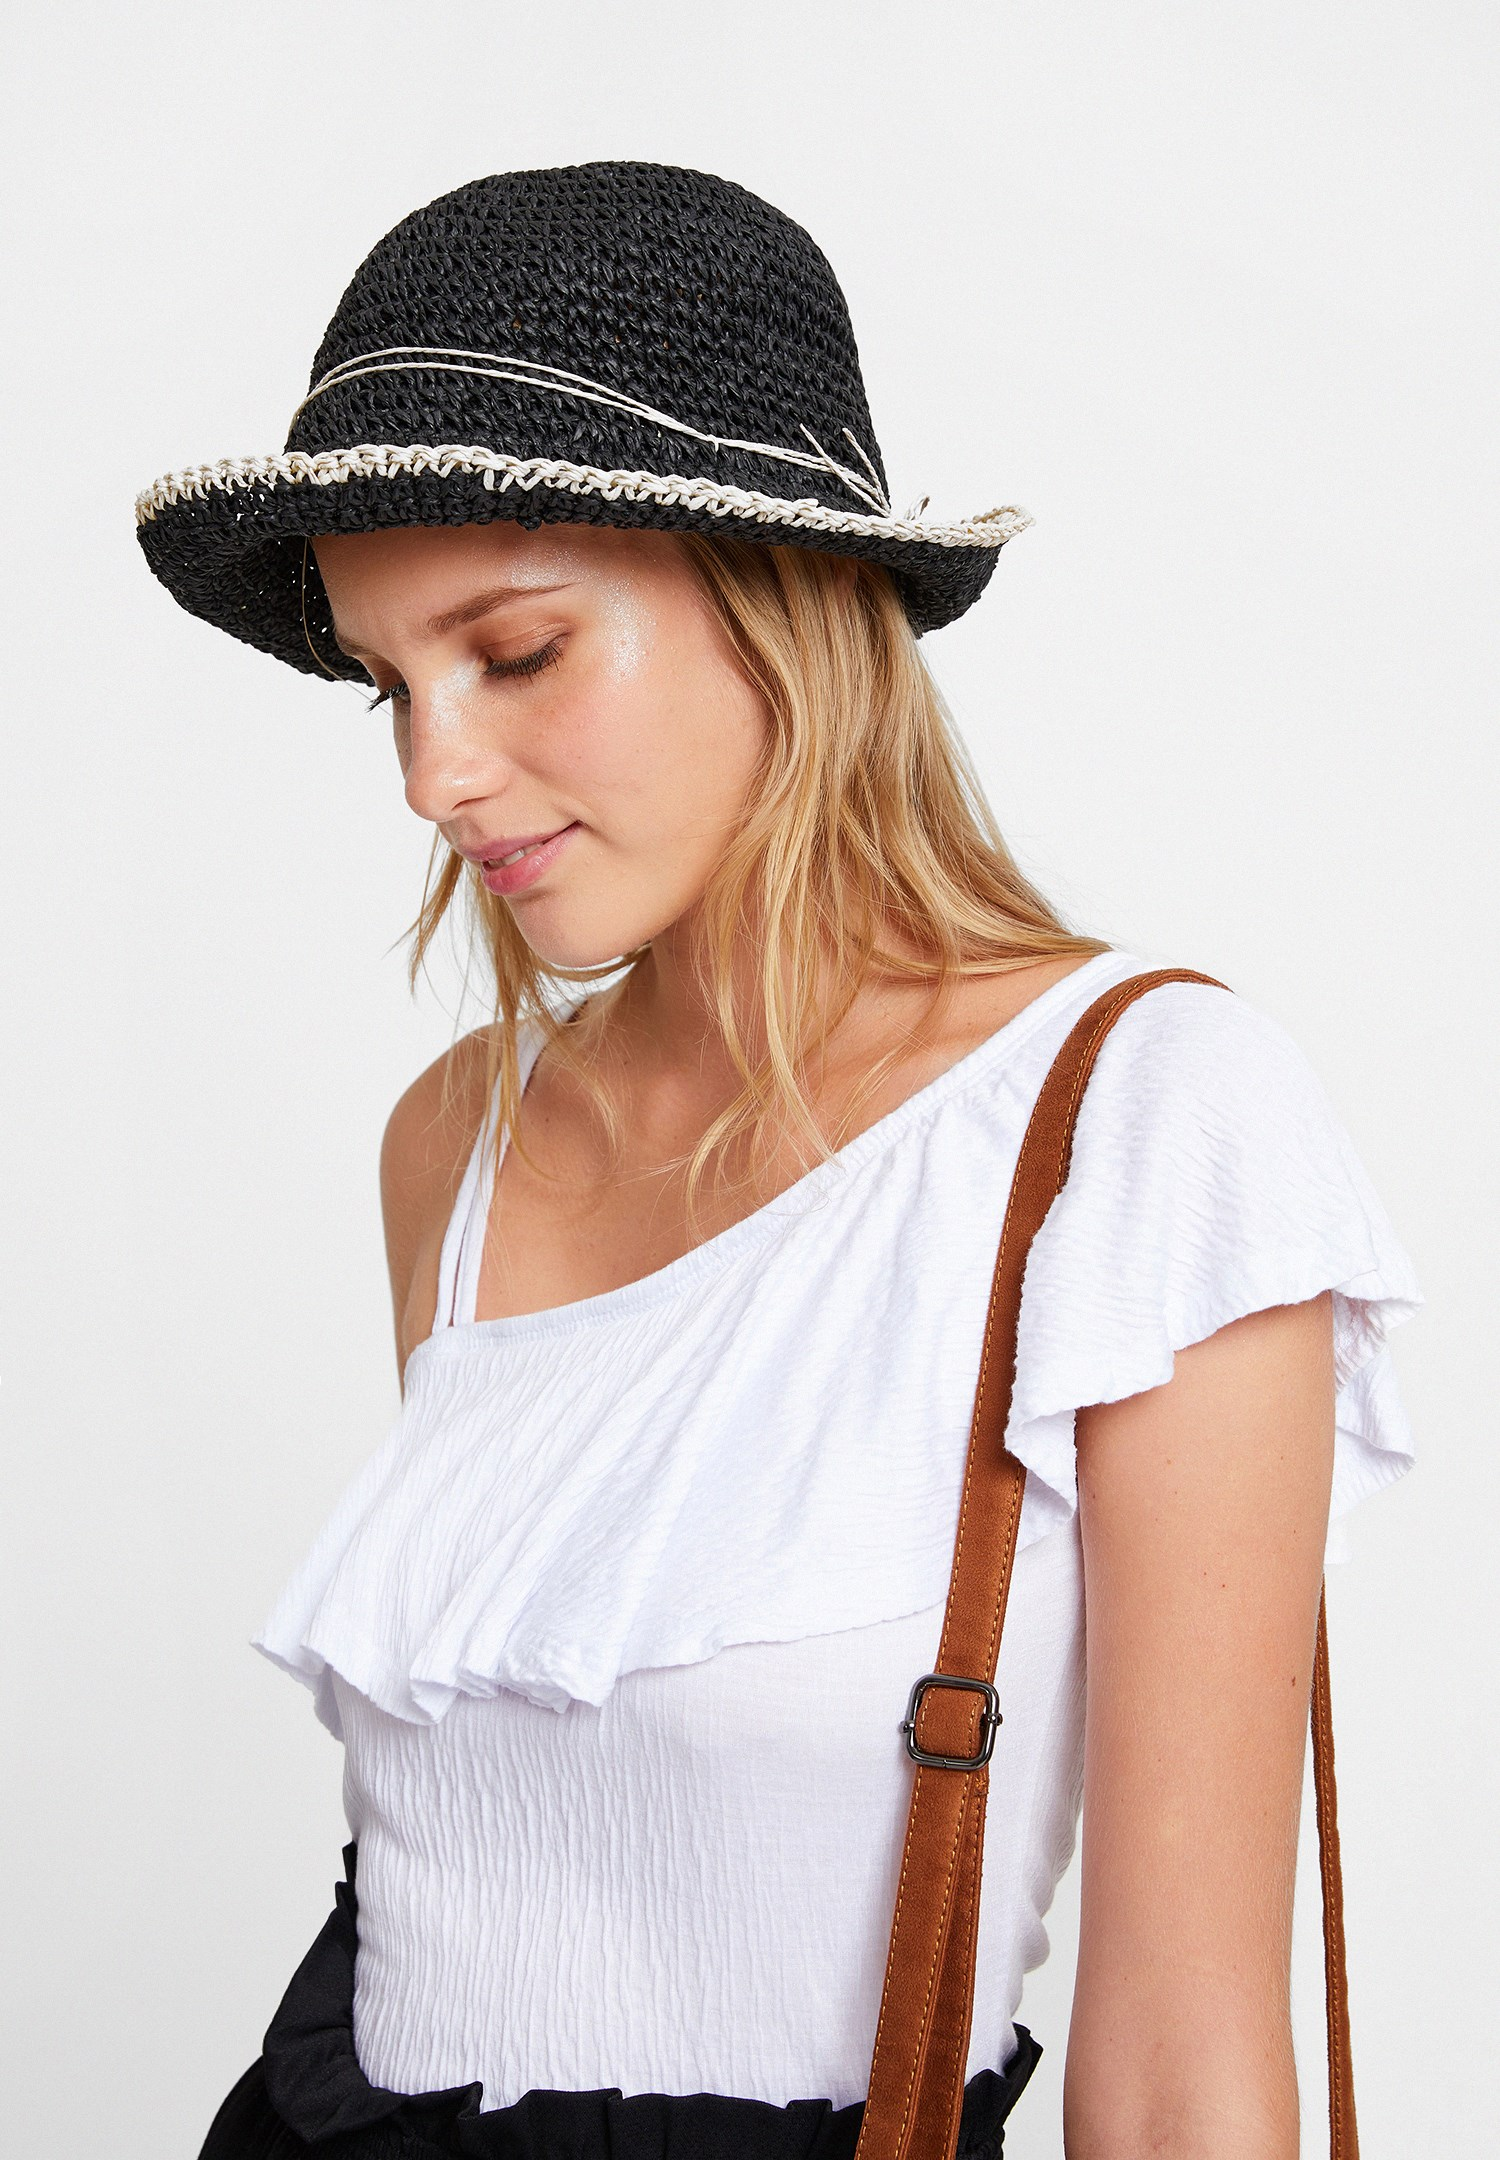 Bayan Siyah İp Bağlama Detaylı Hasır Şapka